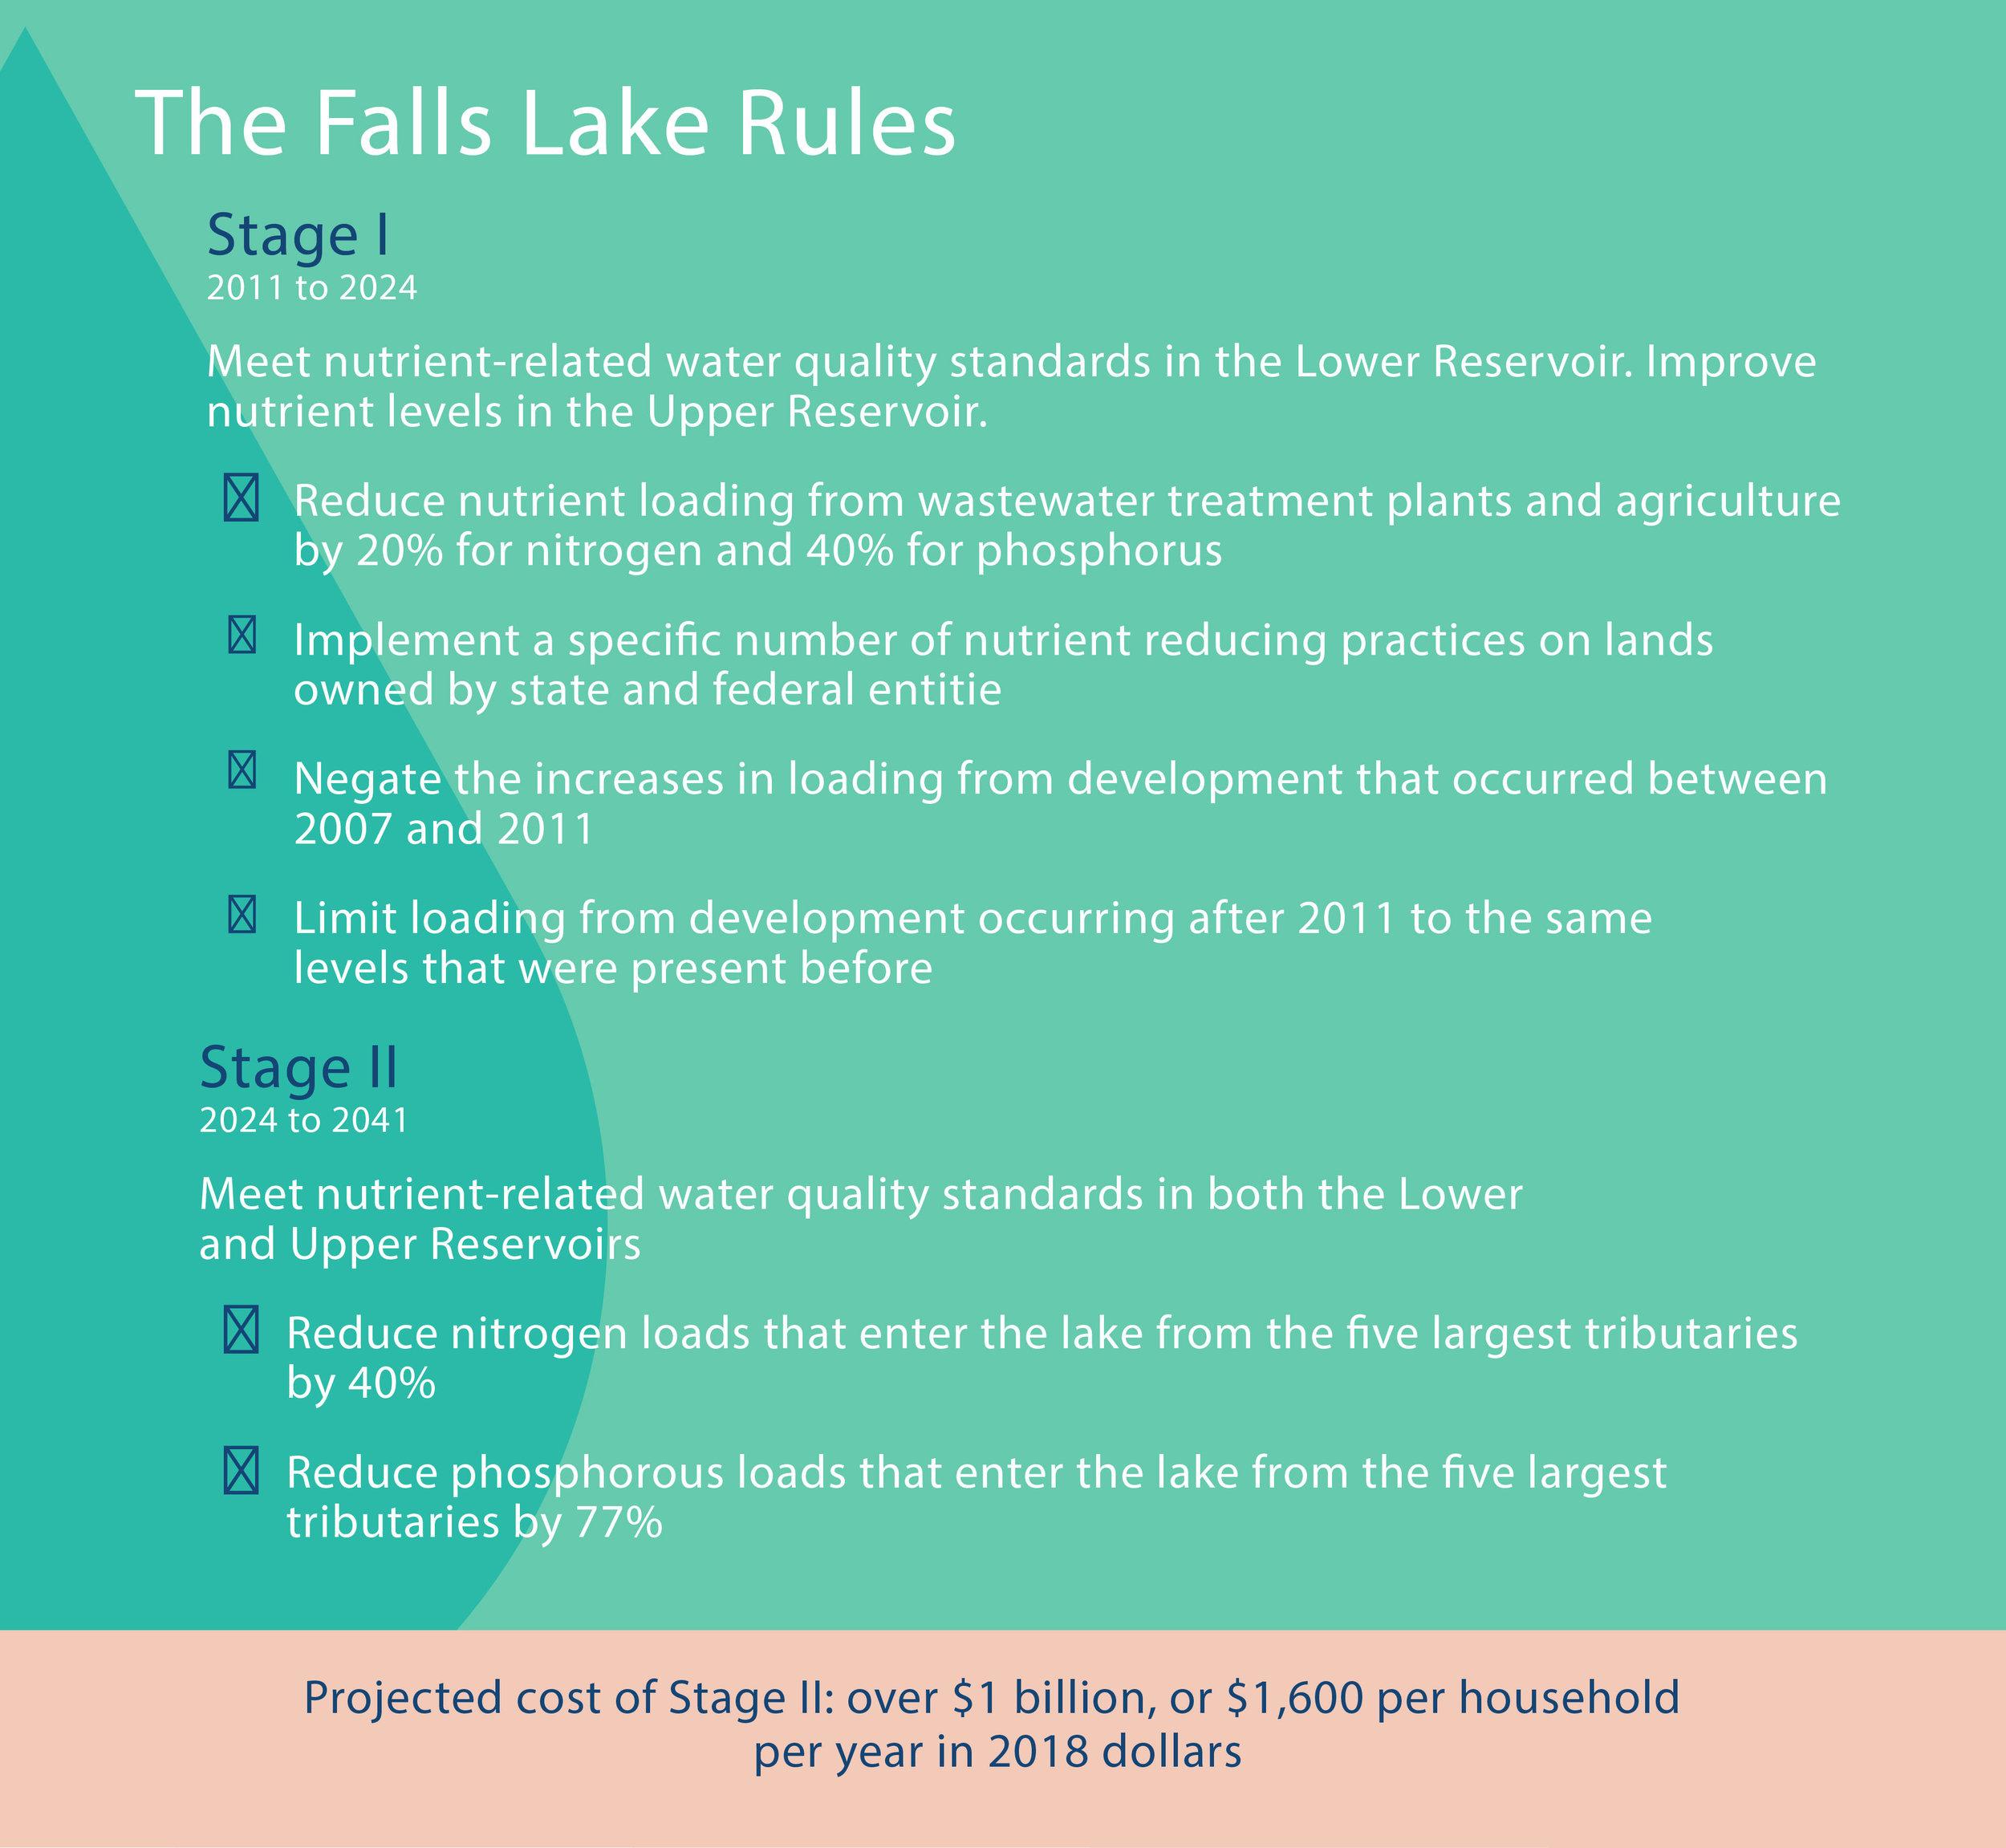 The Falls Lake Rules